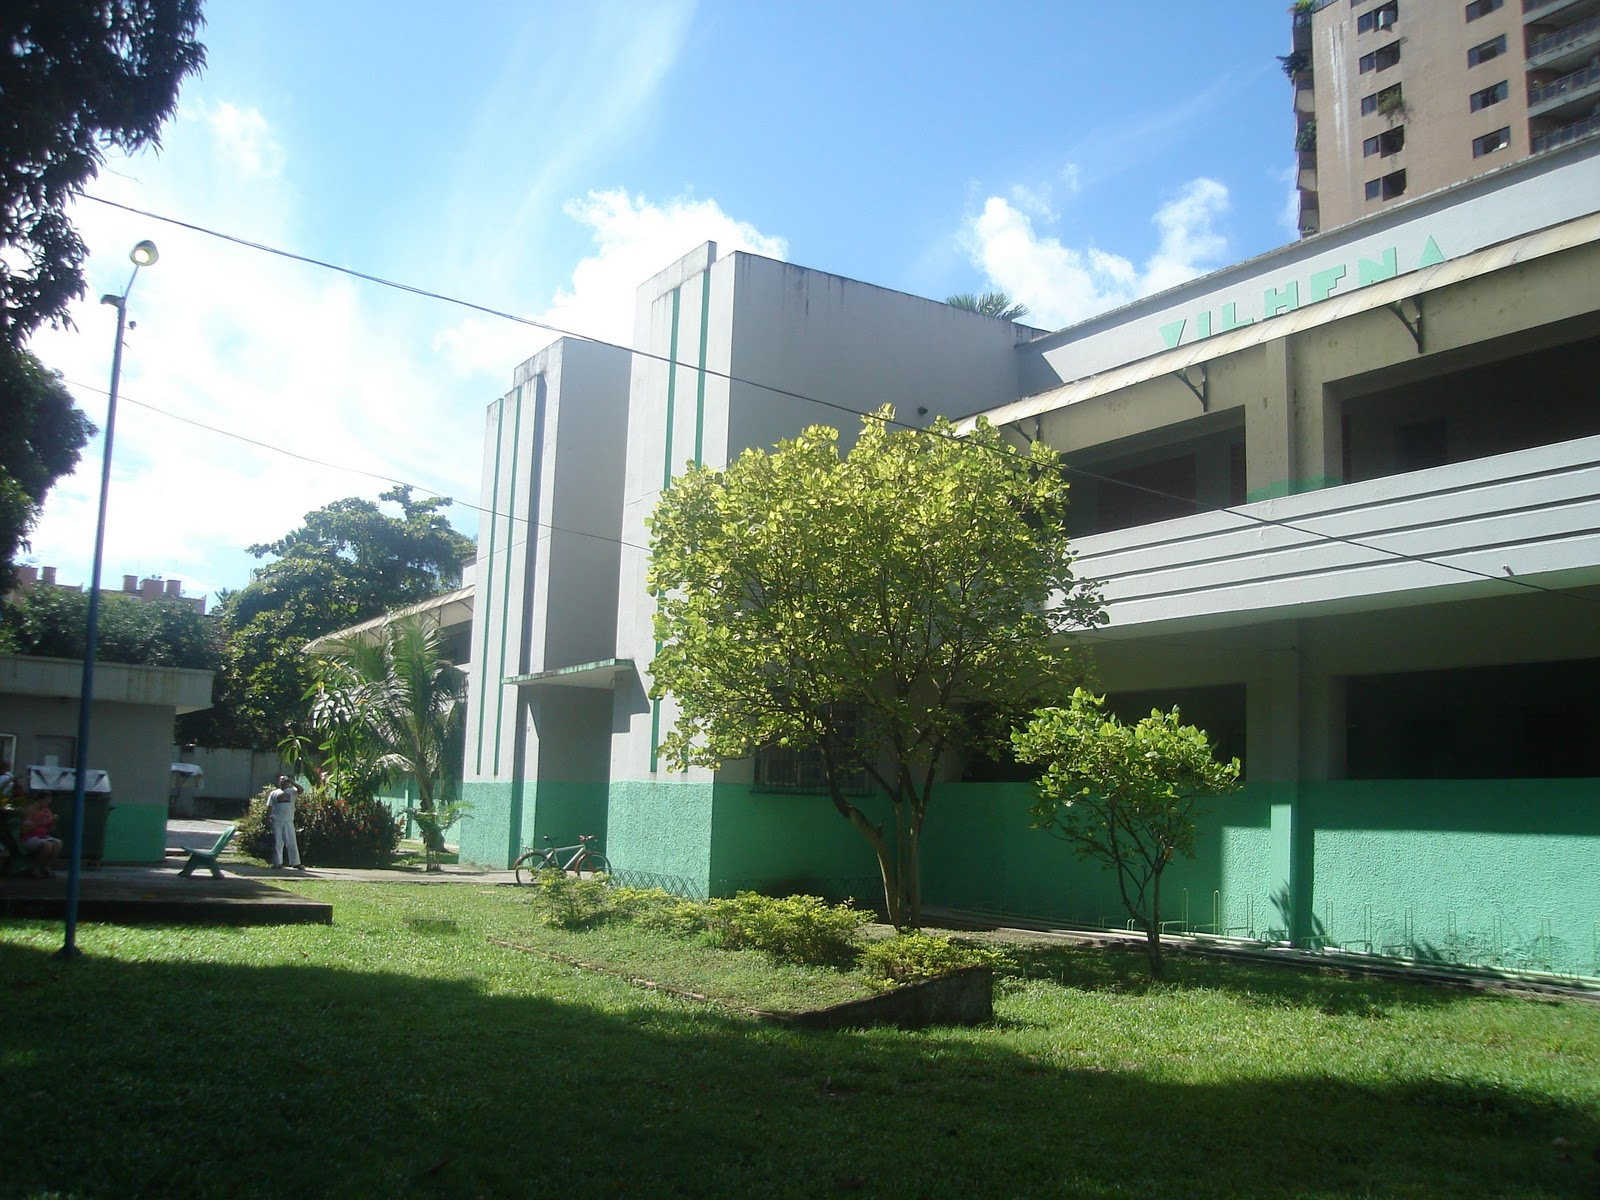 Escola Vilhena Alves